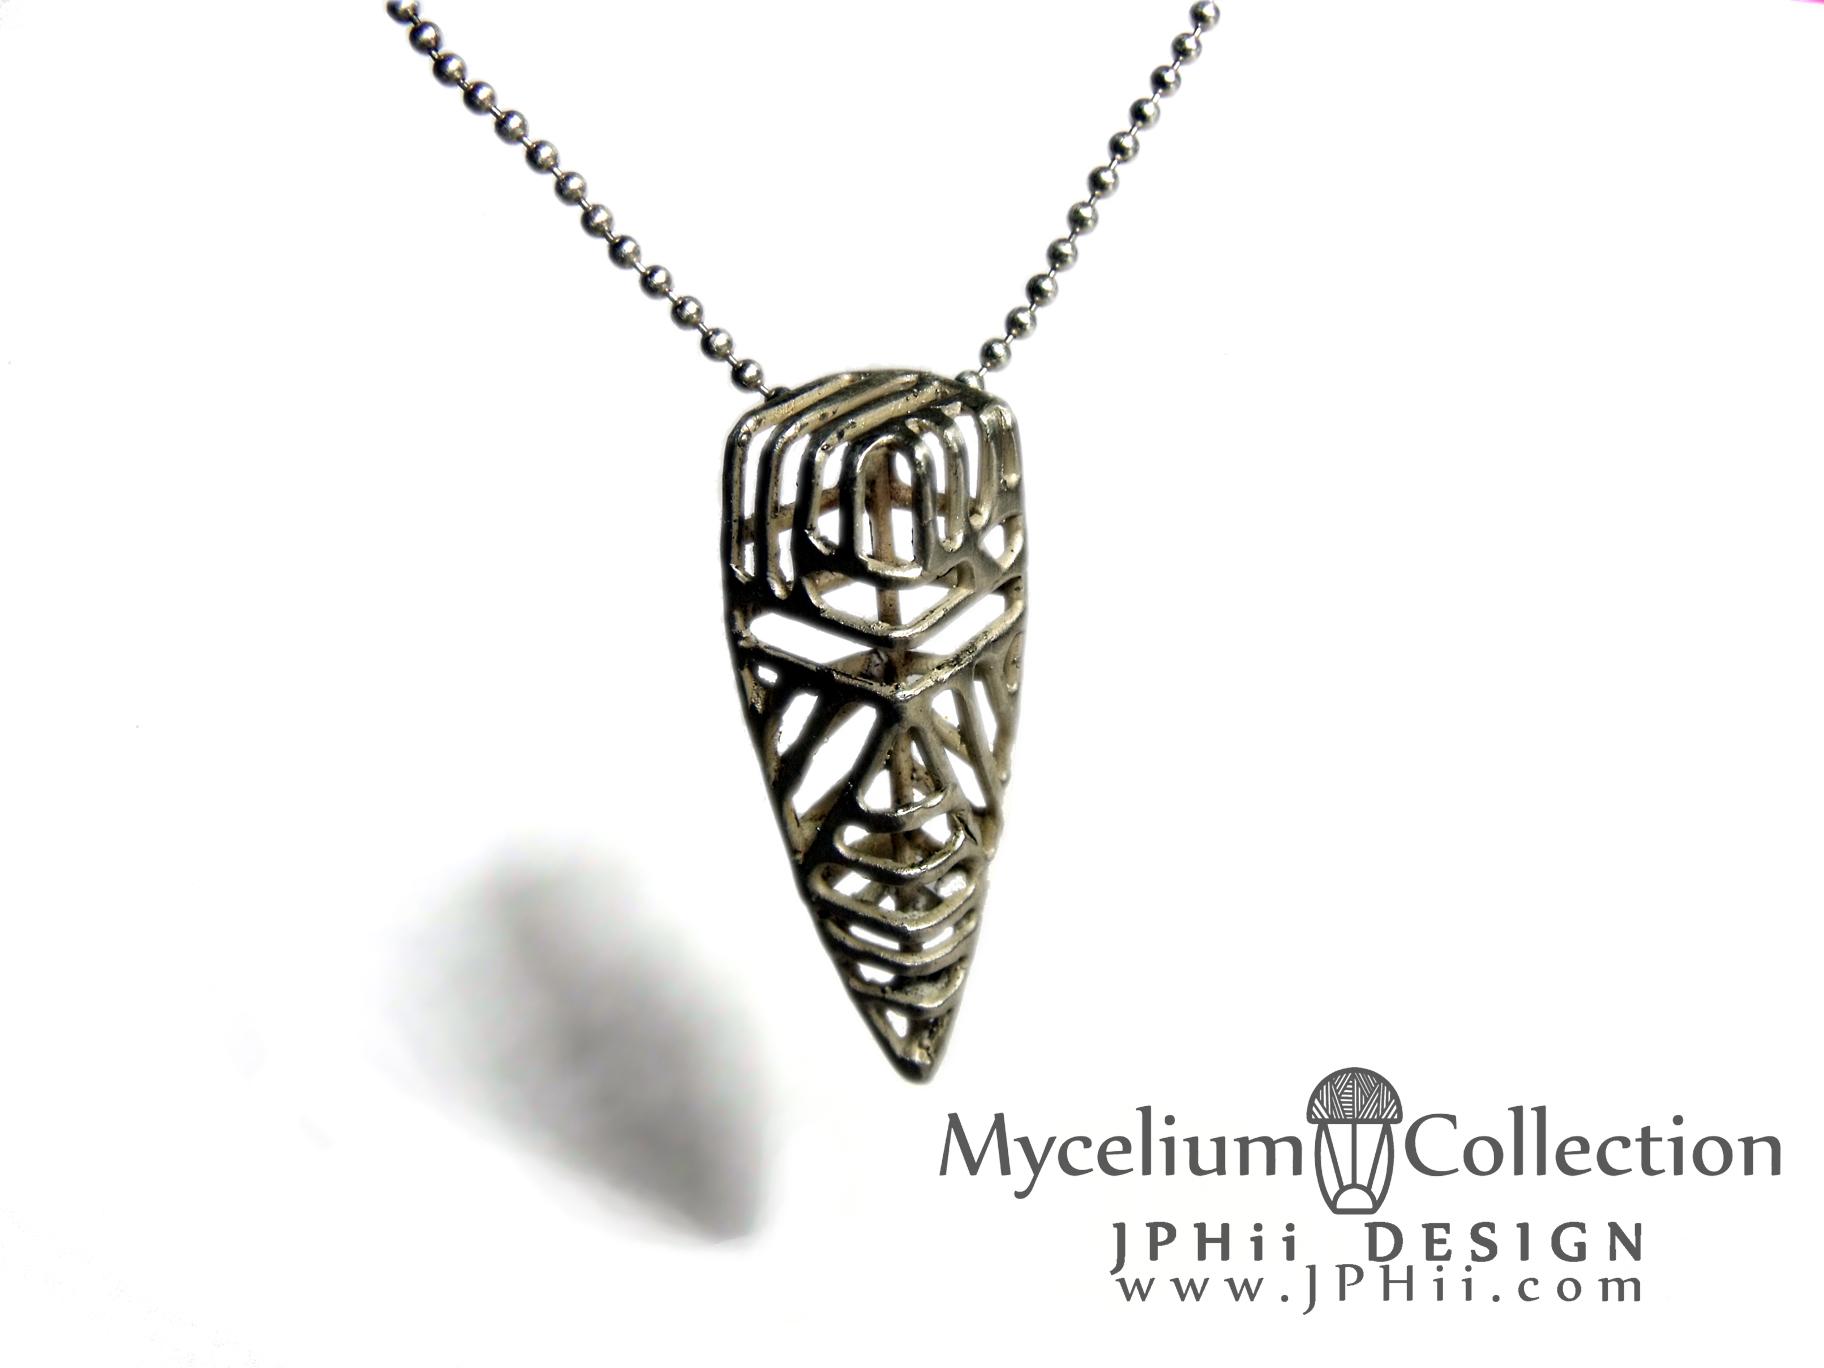 Mycelium Fang Necklace